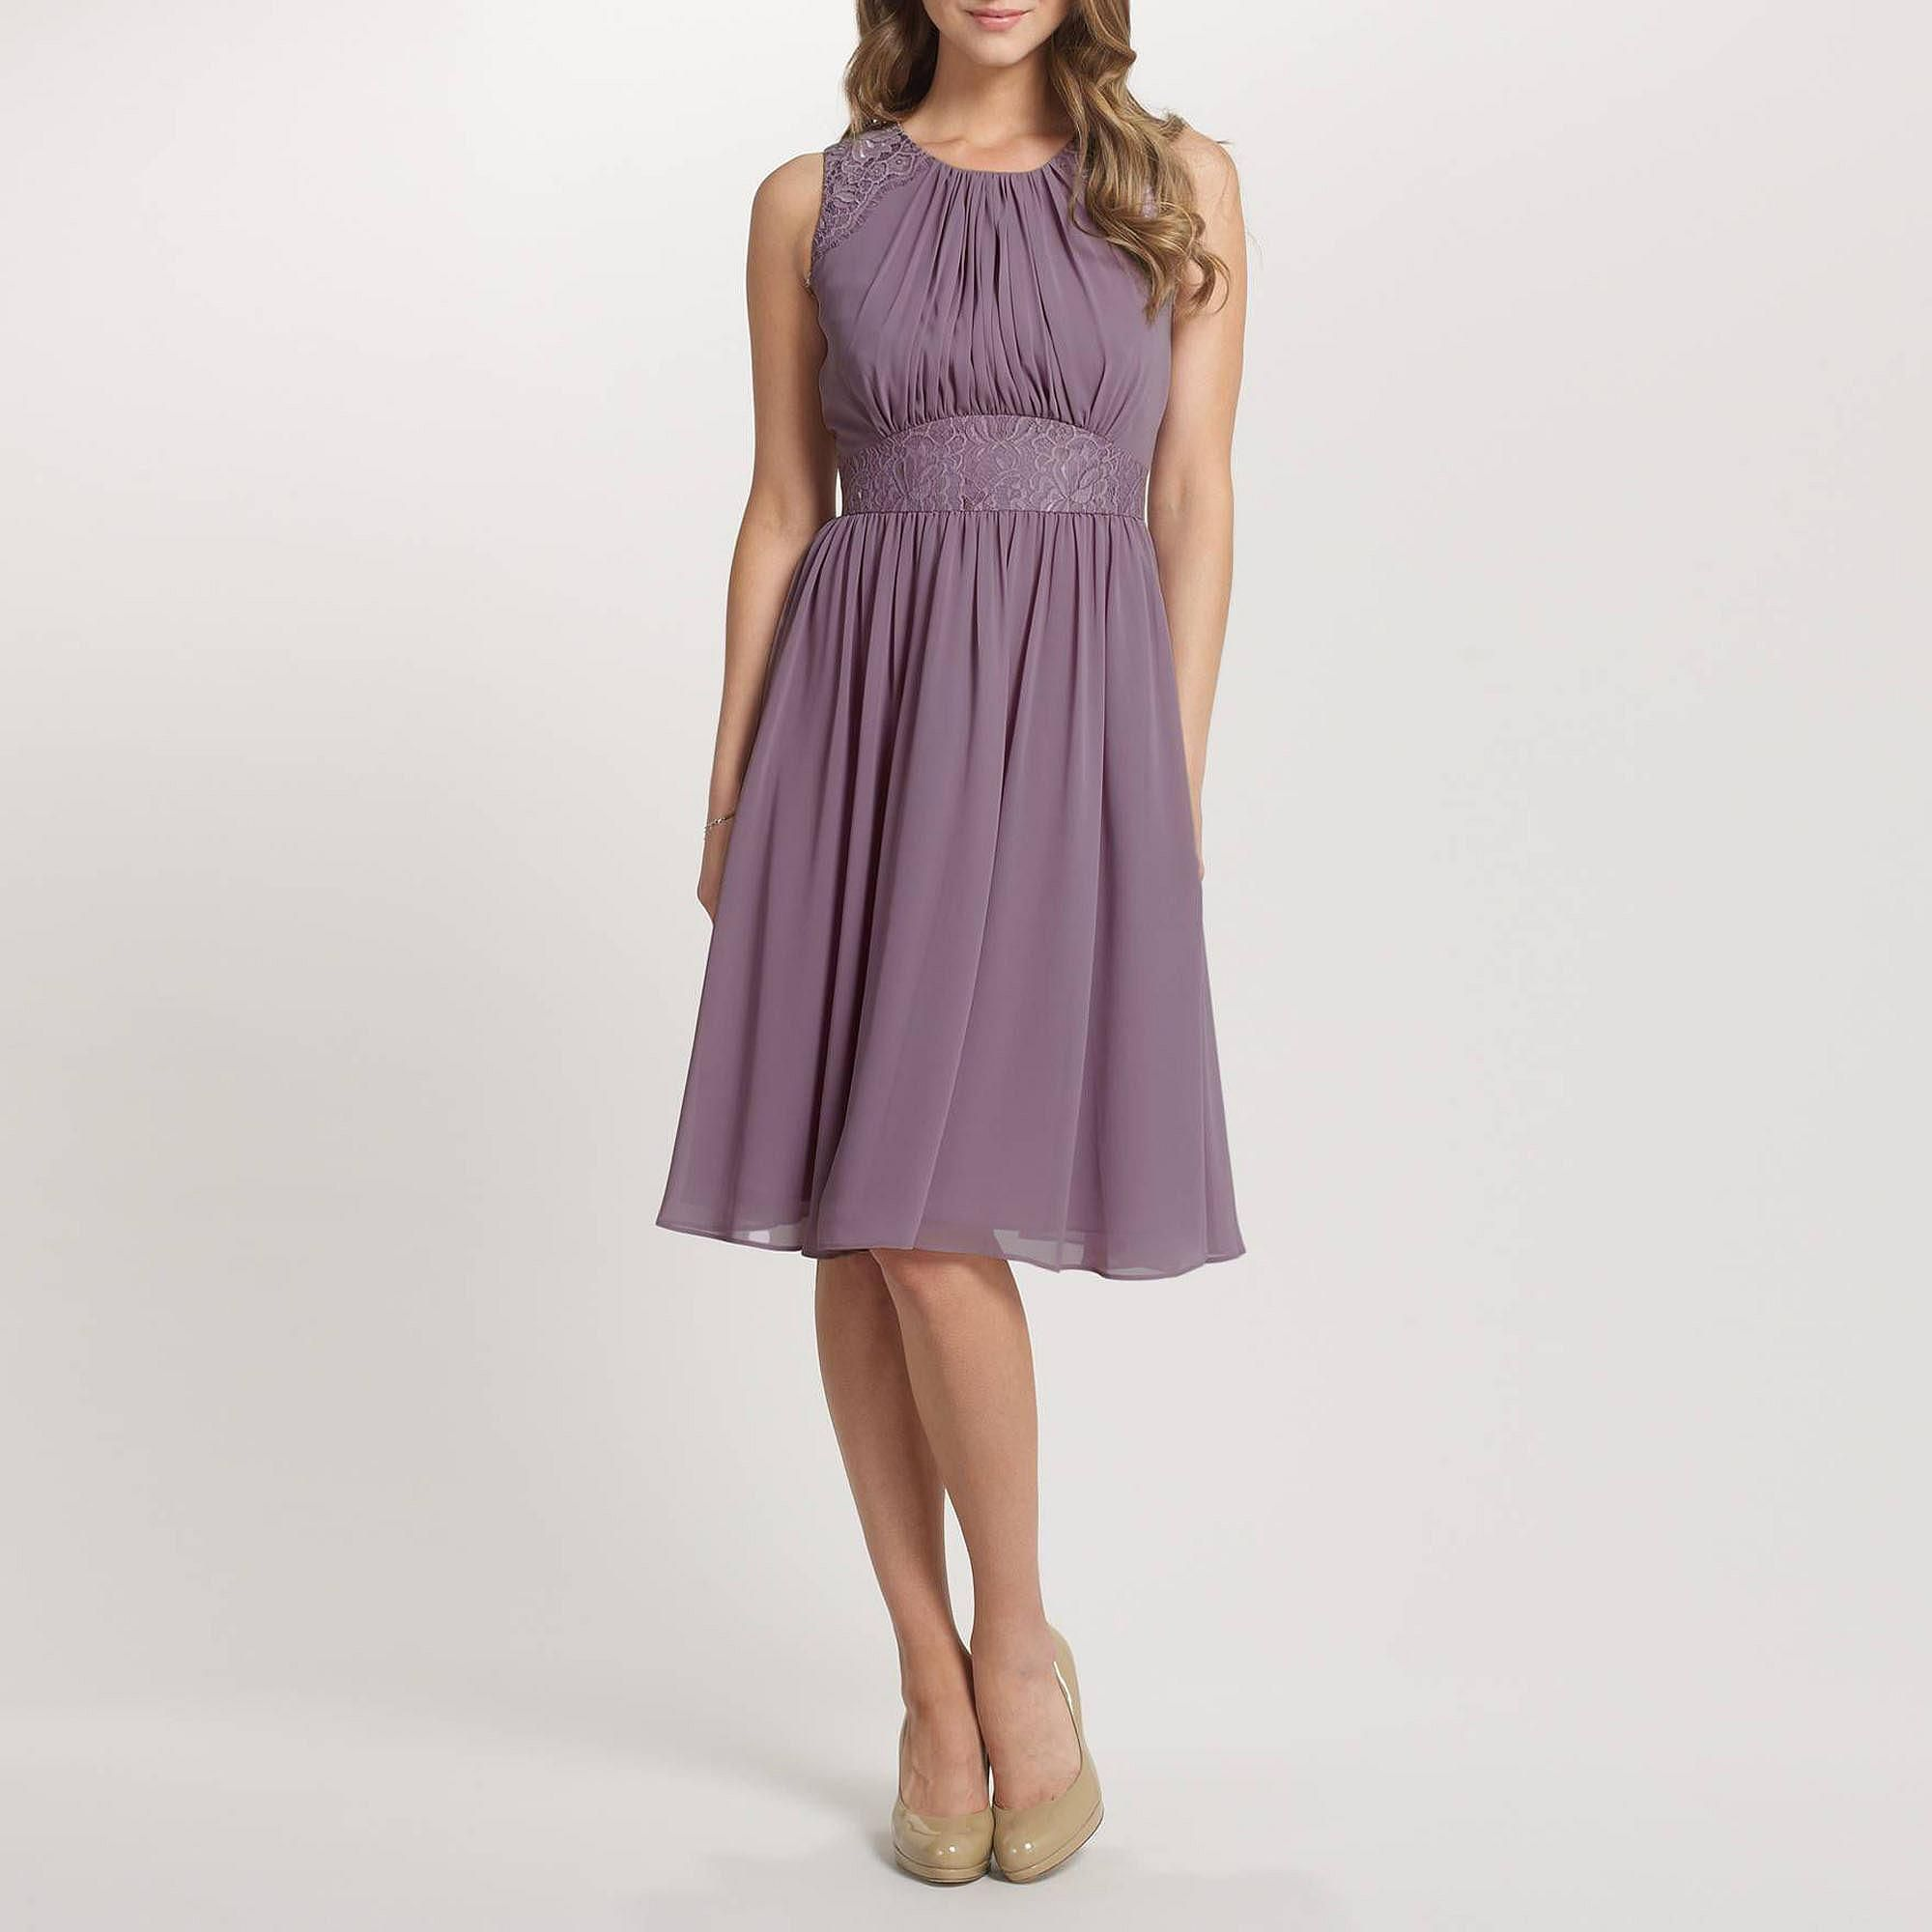 Lavender Alia Chiffon Short Dress - Bridesmaid dresses - Debenhams ...